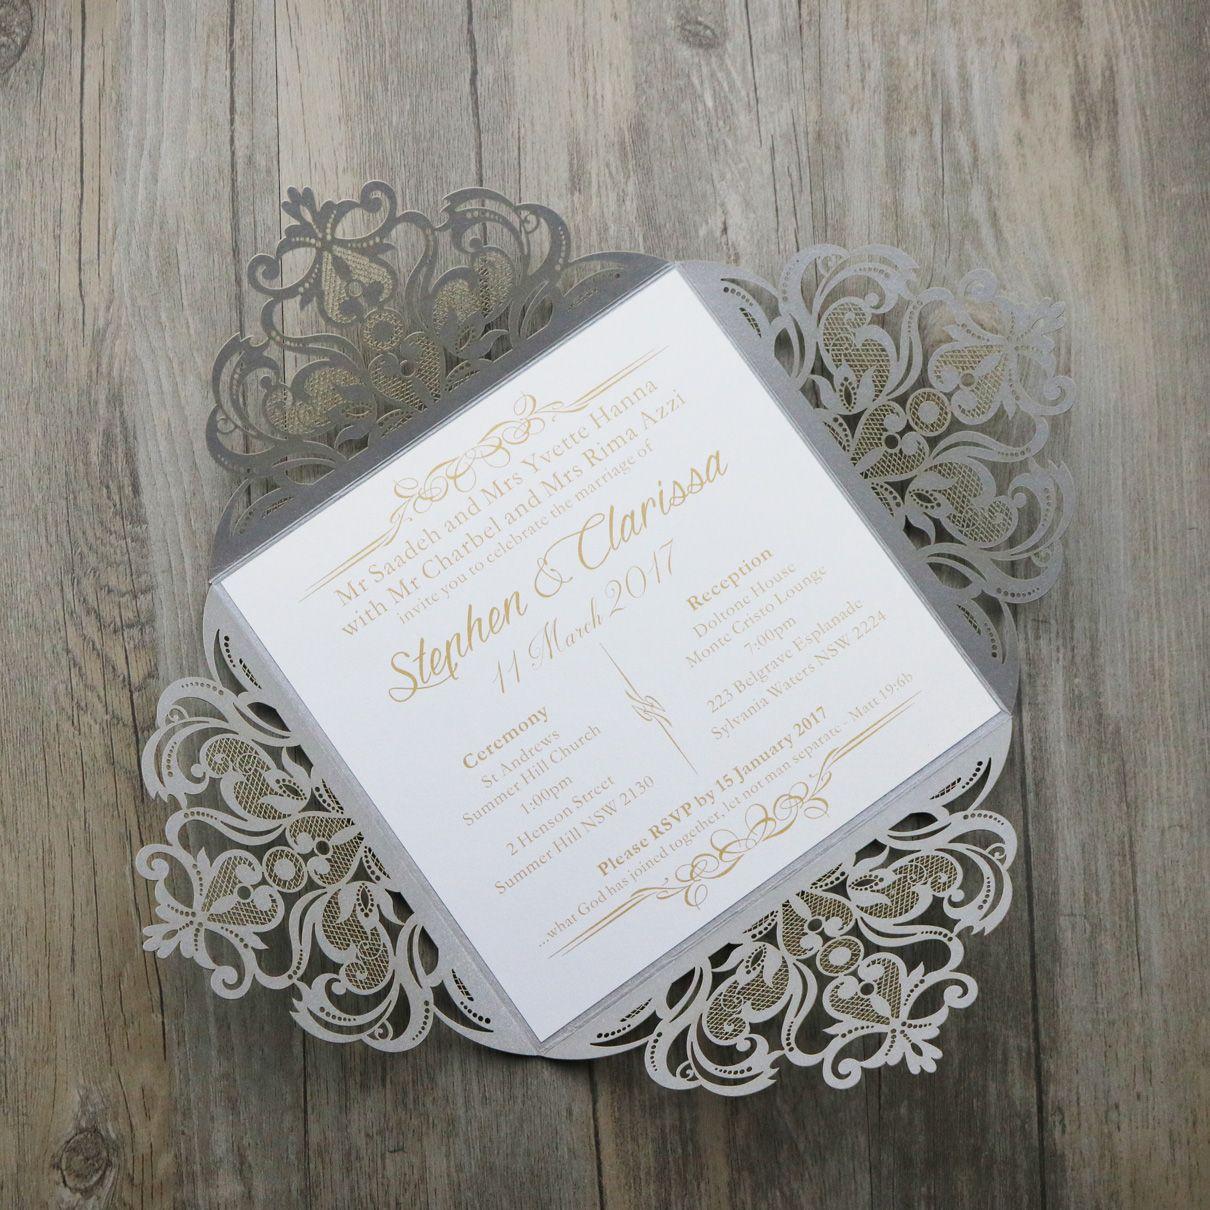 4 Fold Wedding Invitations Cards Silver Paper Laser Cutting Wedding  Invitation Flowers Hollow Wedding Cards Fast Wedding Invitations Free Wedding  Invitation ...